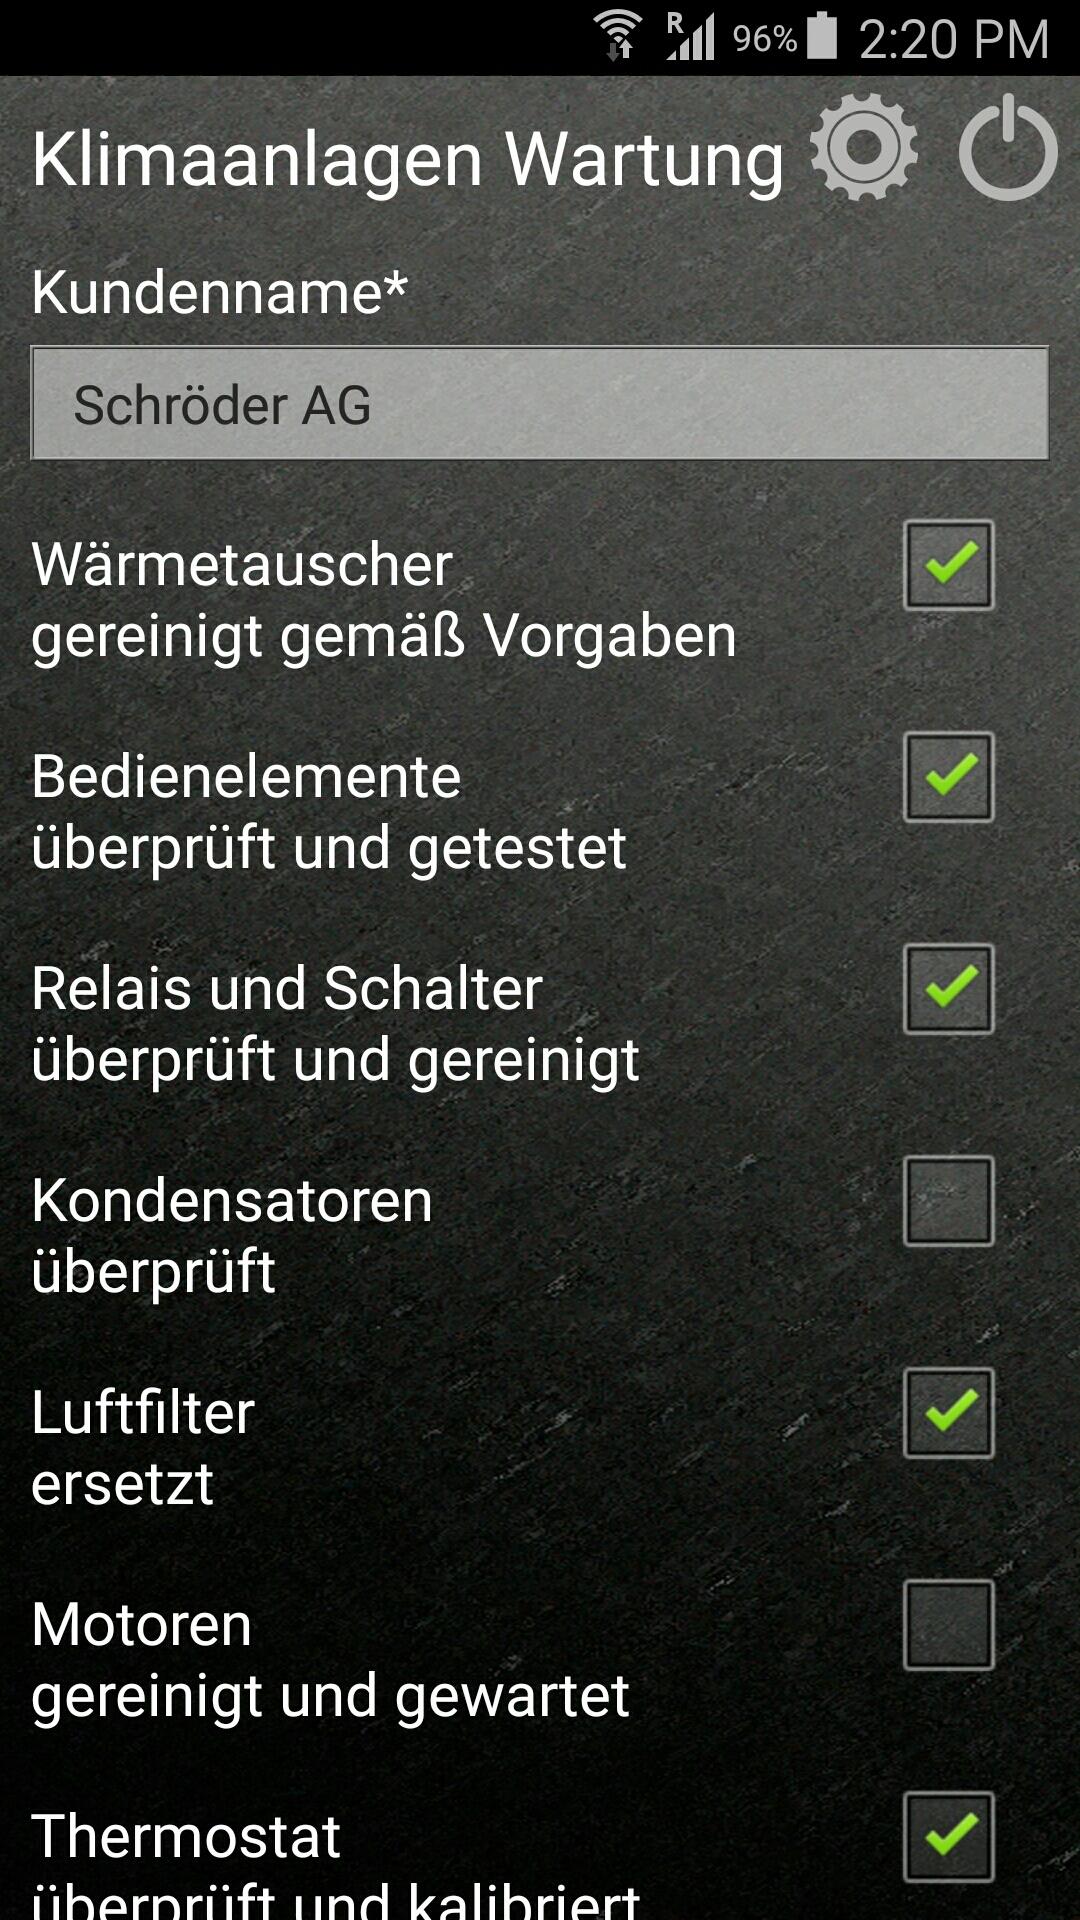 ginstr_app_airConditionerMaintenance_DE_2